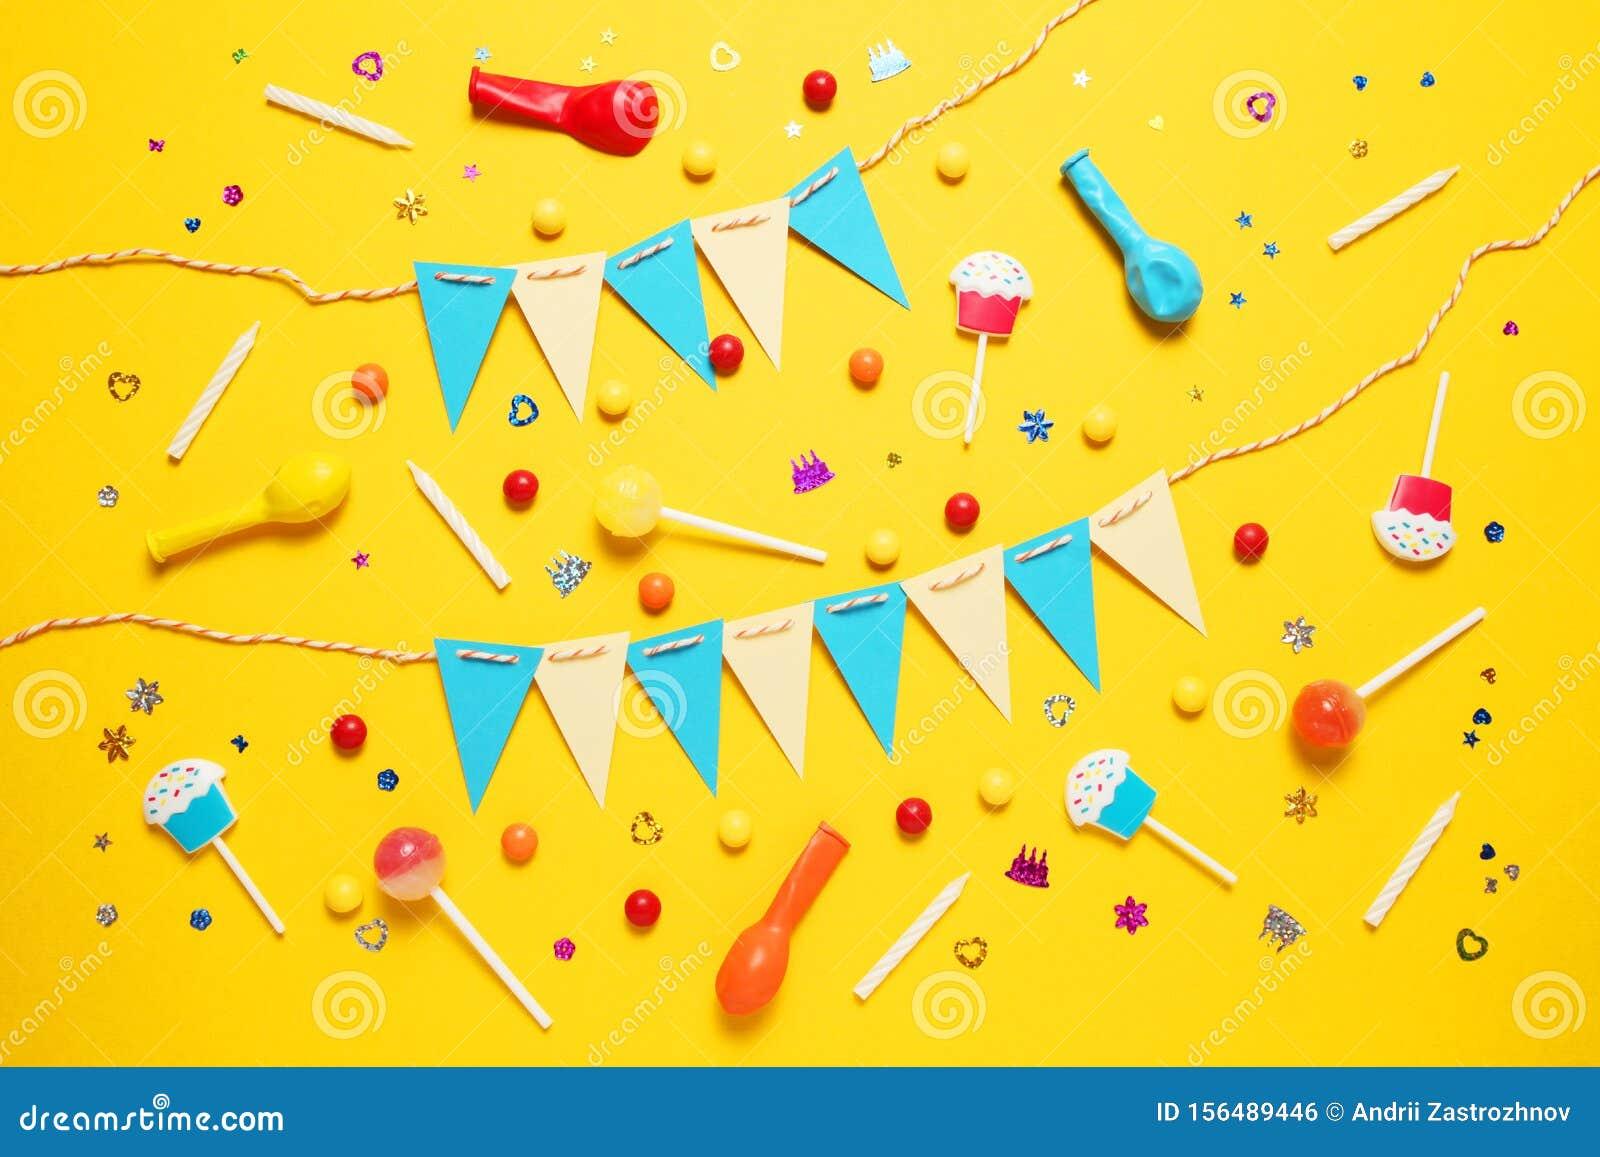 Colorful happy birthday decor for children party. Invitation